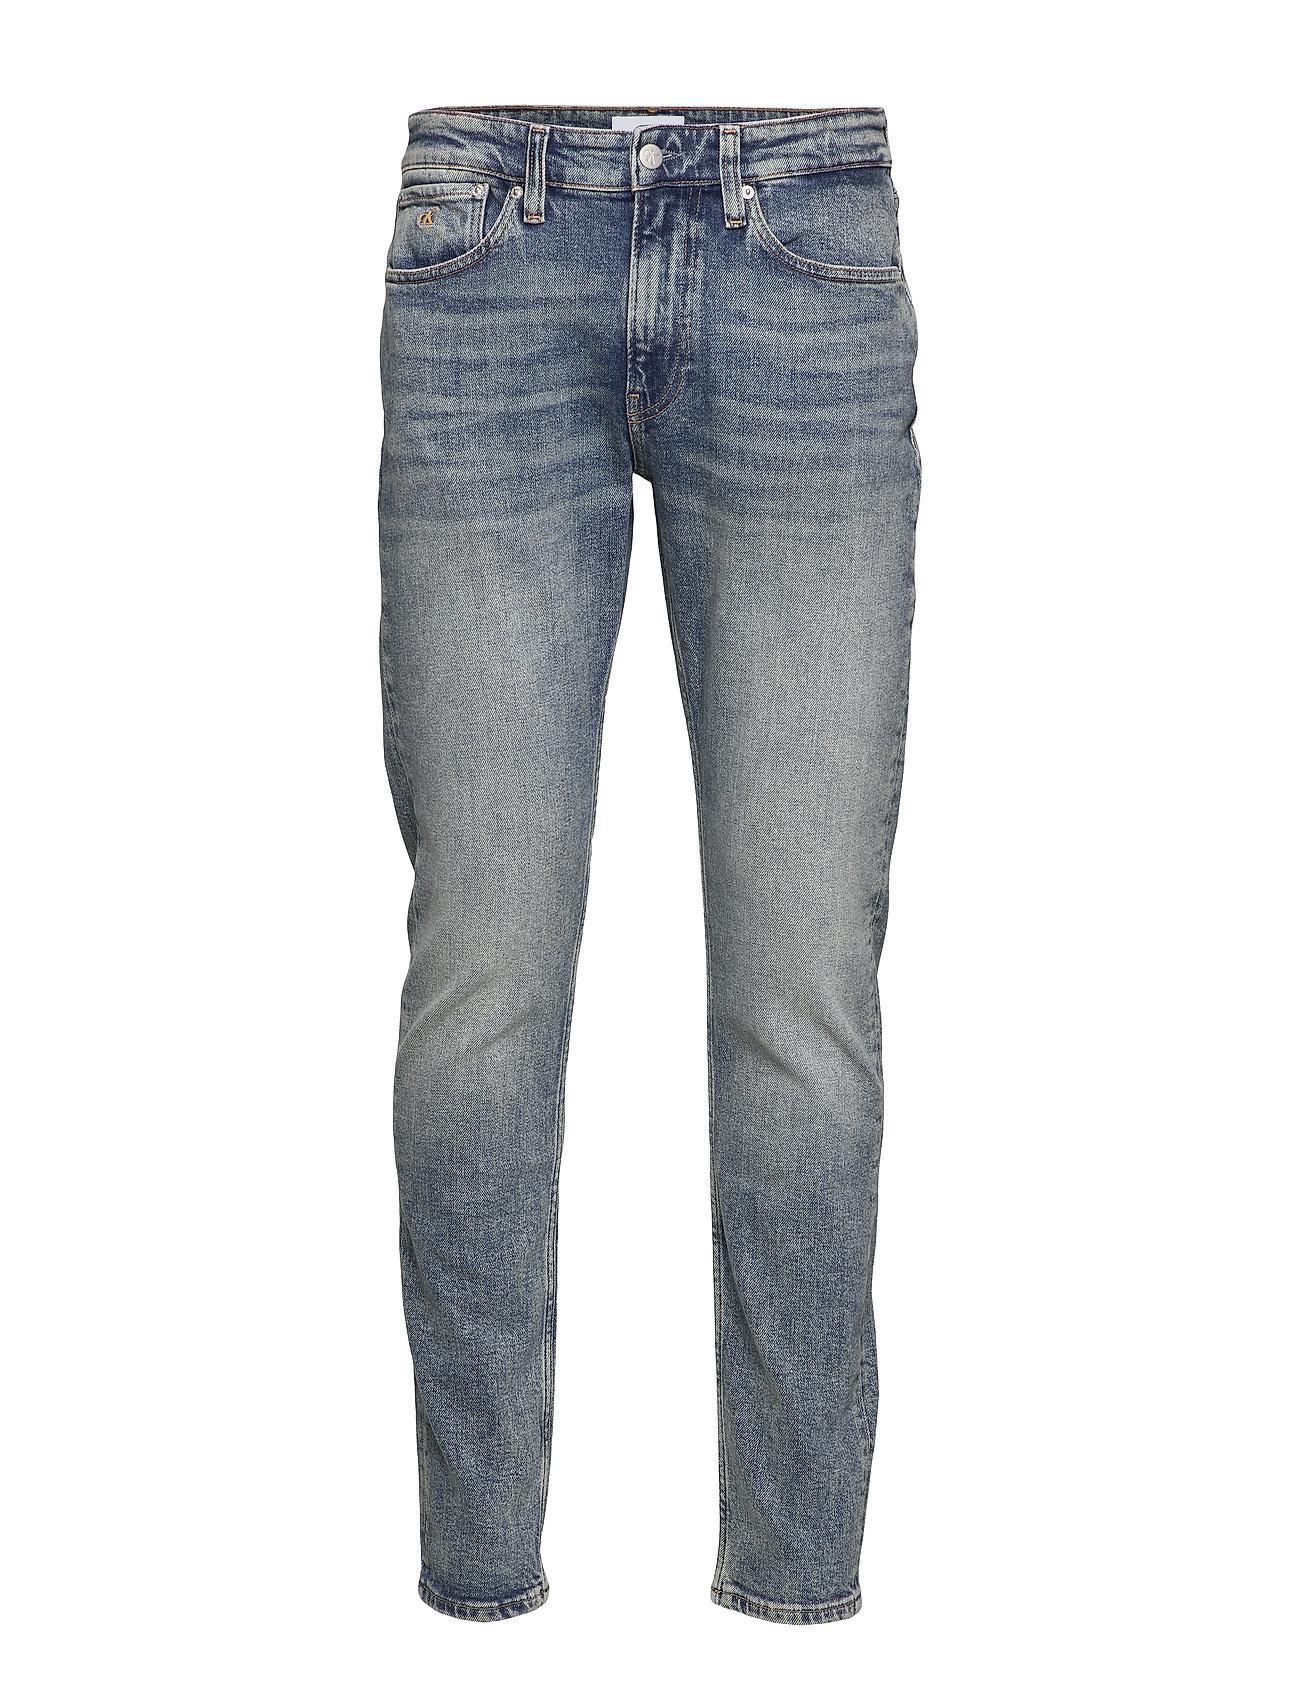 Calvin Klein Jeans CKJ 058 SLIM TAPER - CA015 BRIGHT BLUE